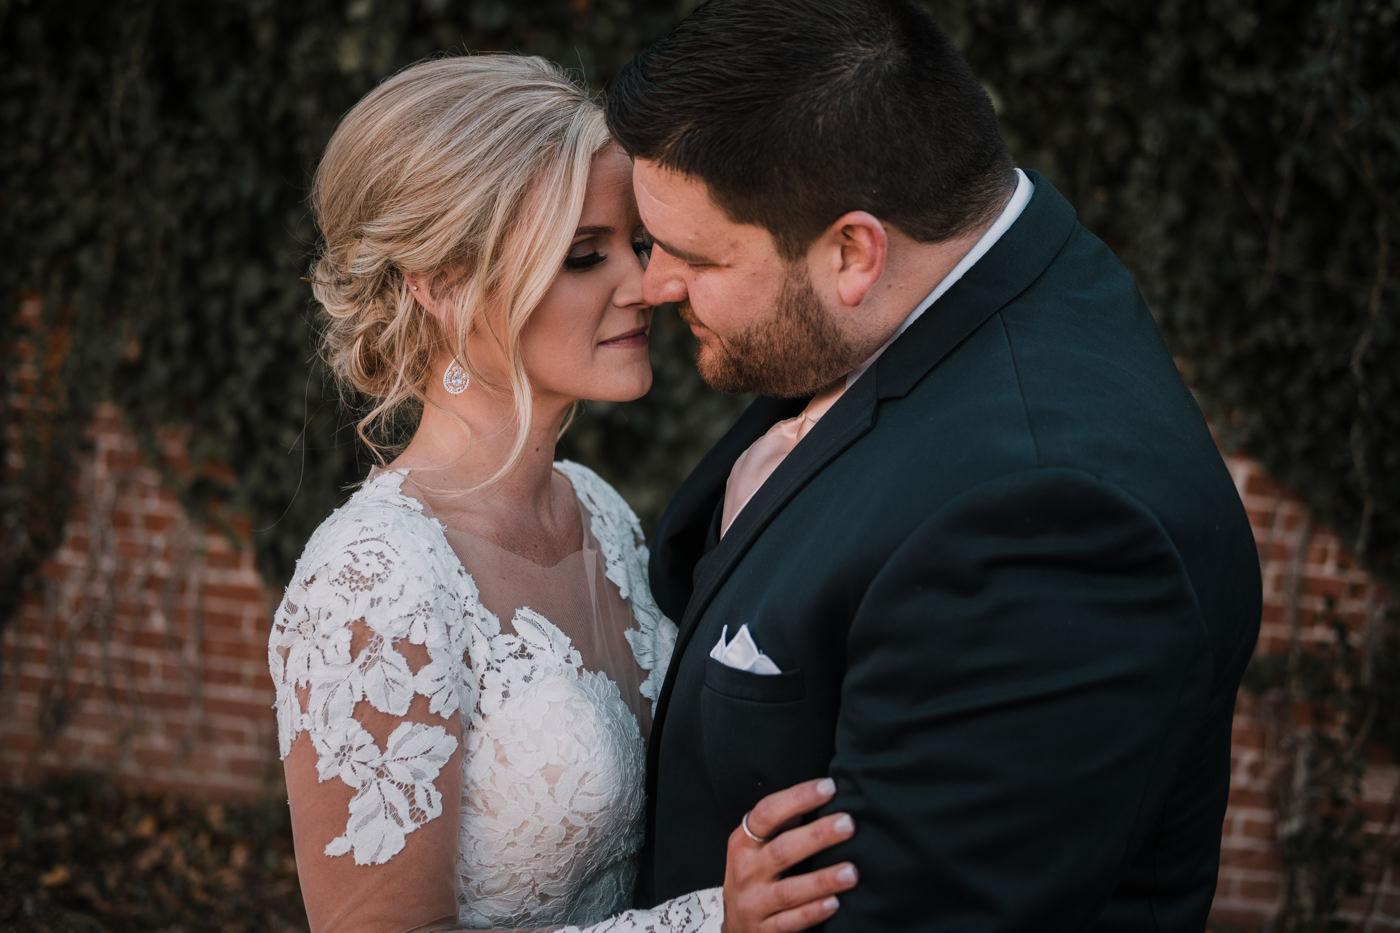 ravington.wedding.northwestarkansas.mileswittboyer-16.jpg